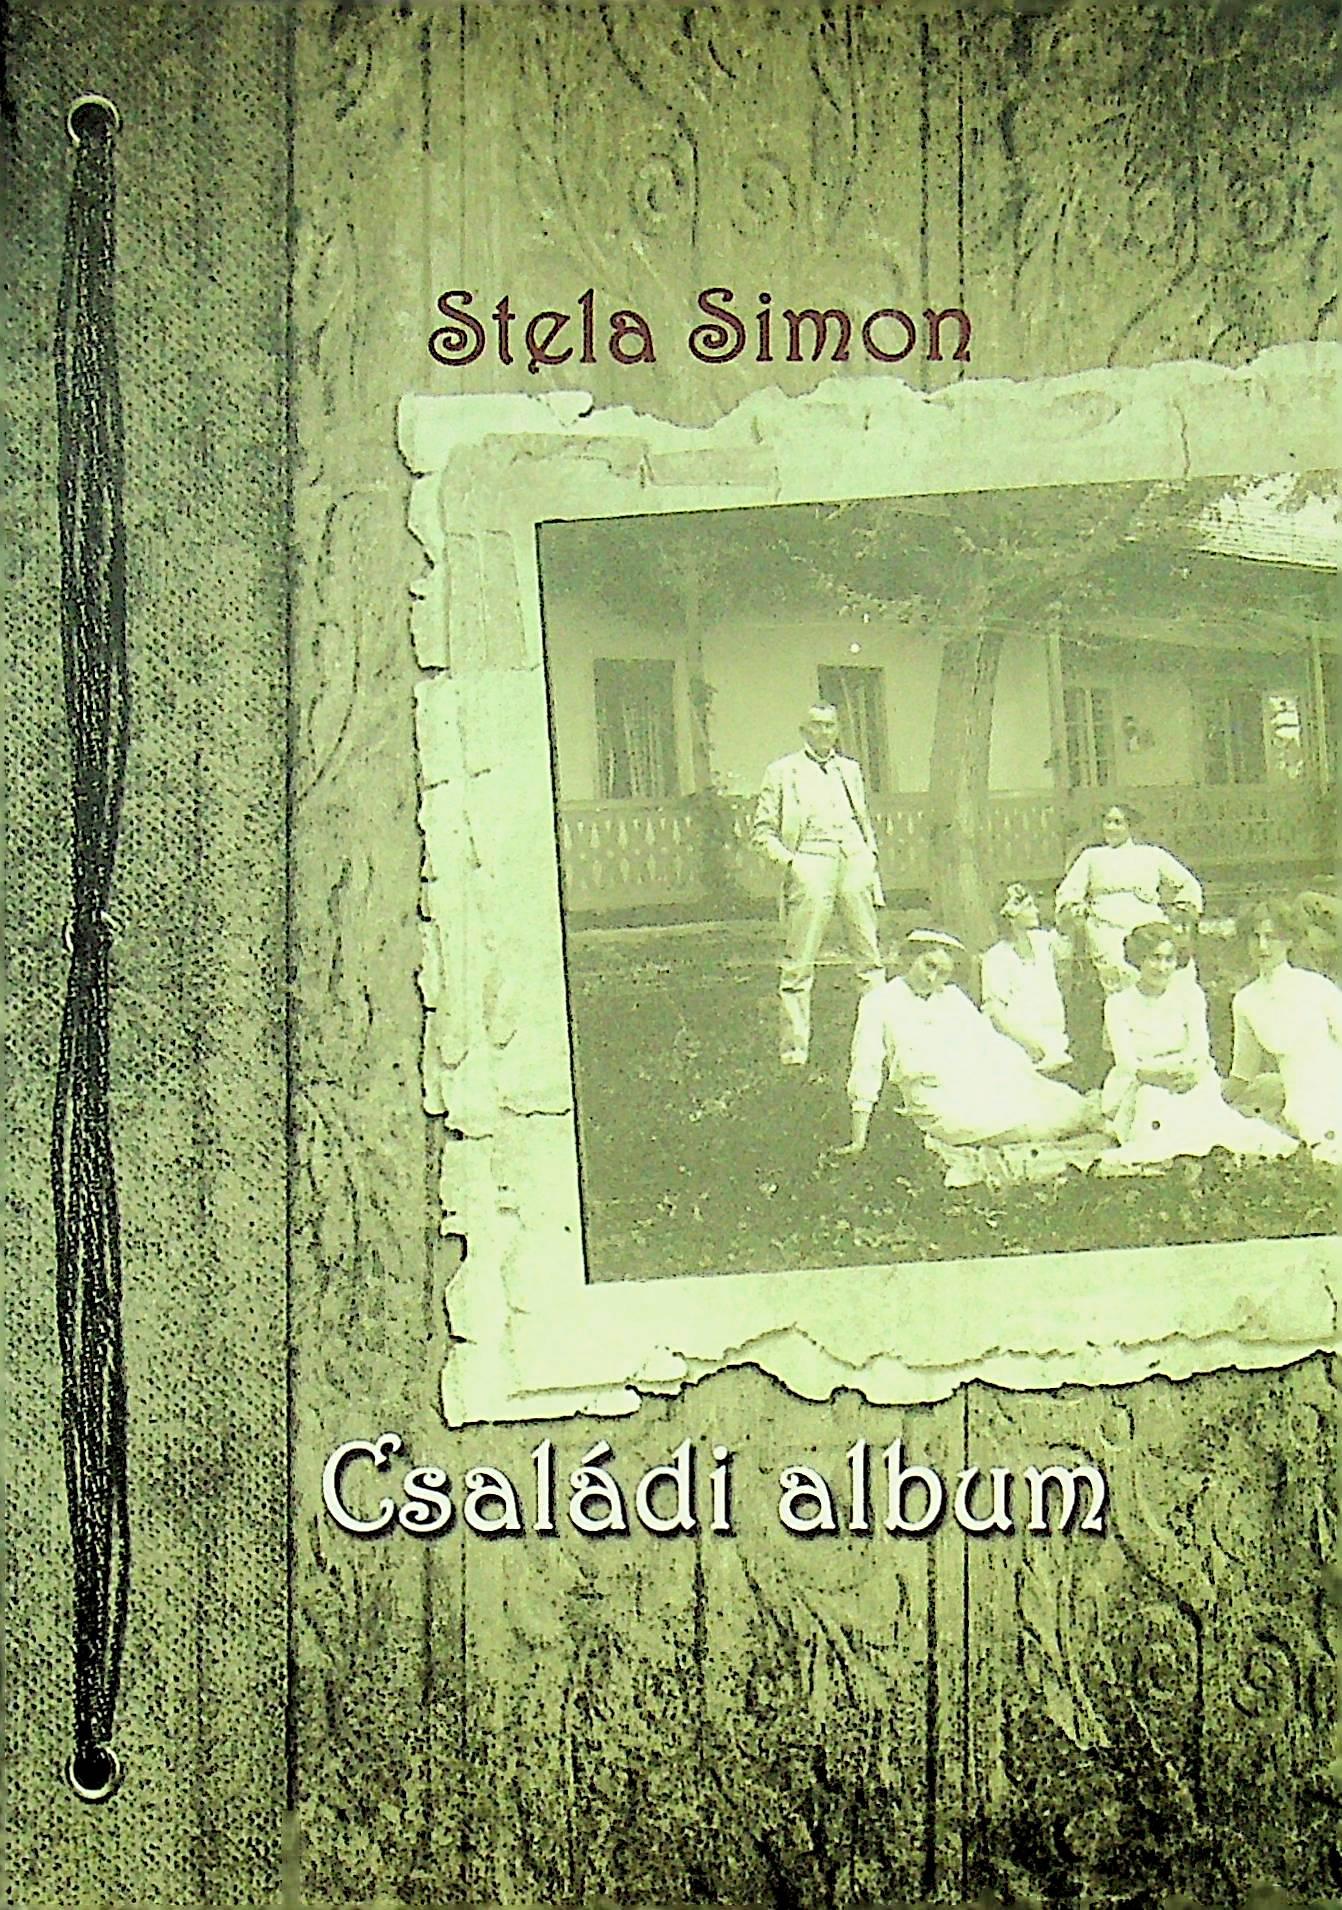 Családi album - Temesváros